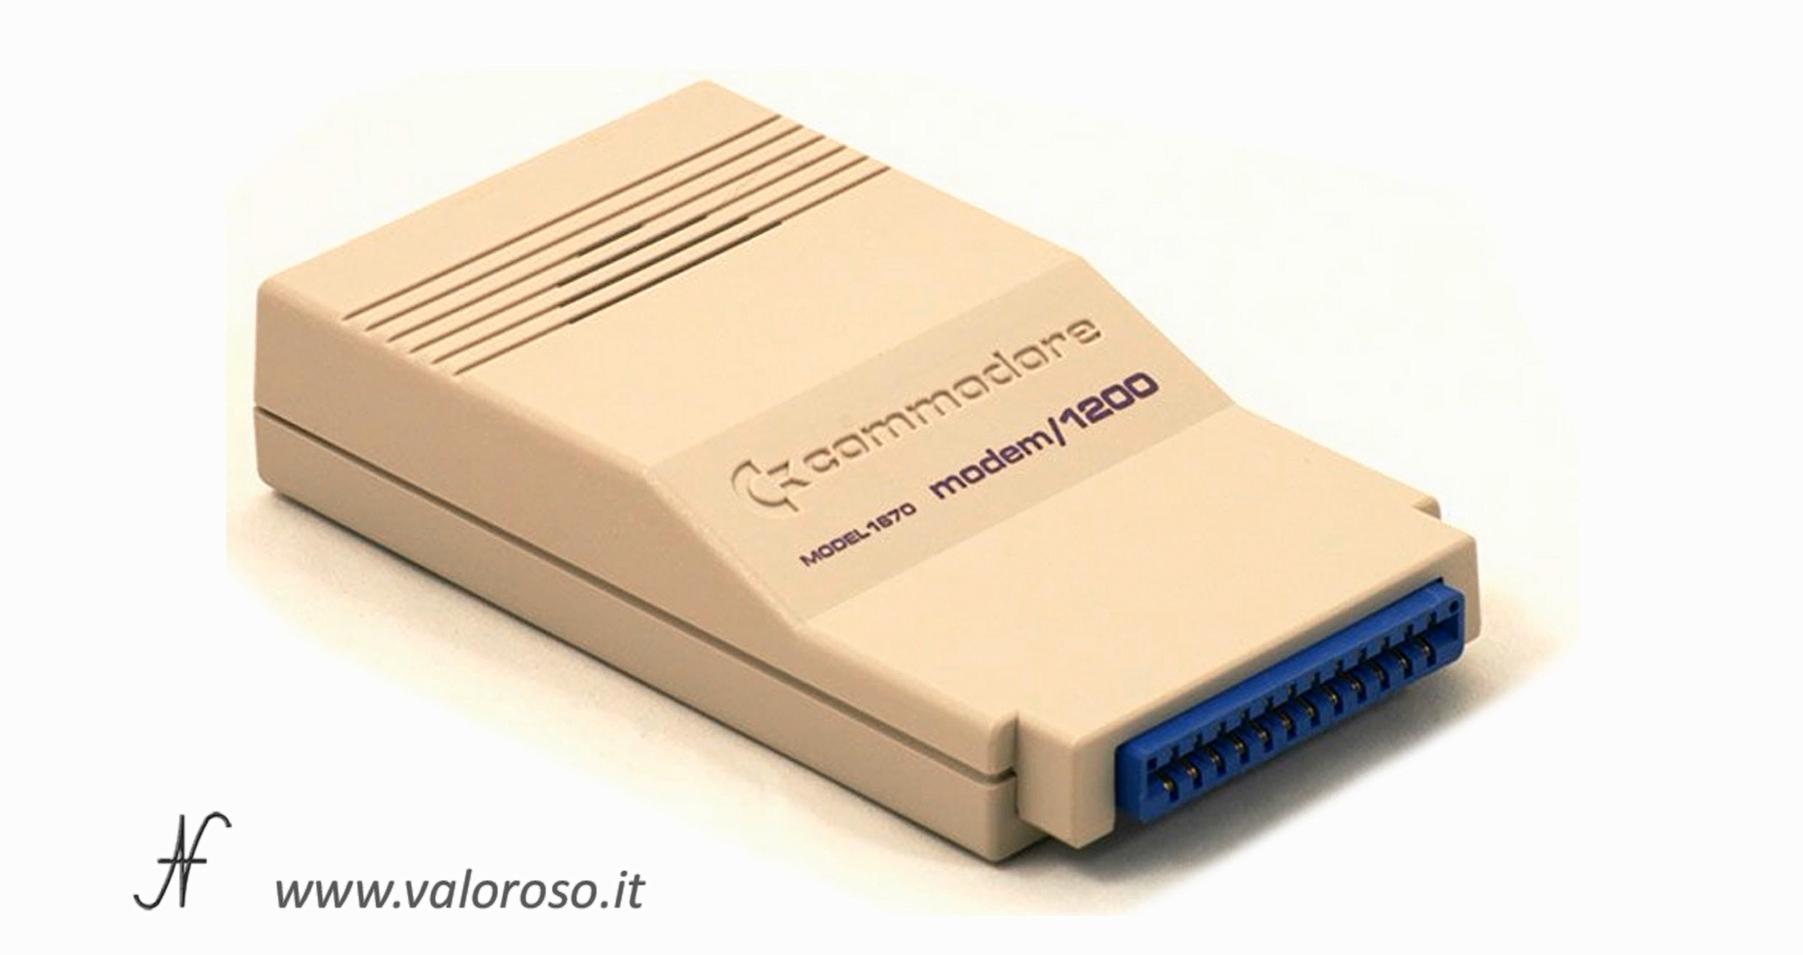 Modem Commodore 1670, 1200 baud